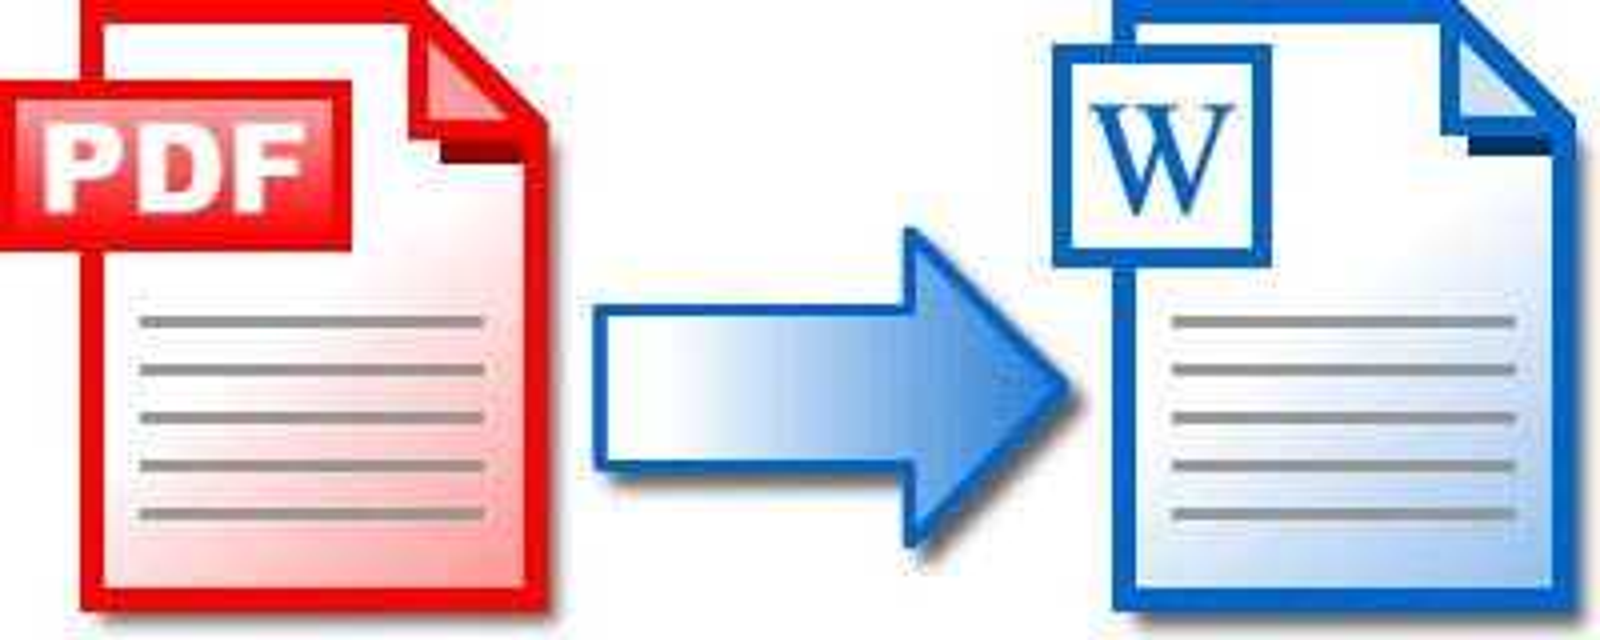 iStonsoft PDF to Word Converter